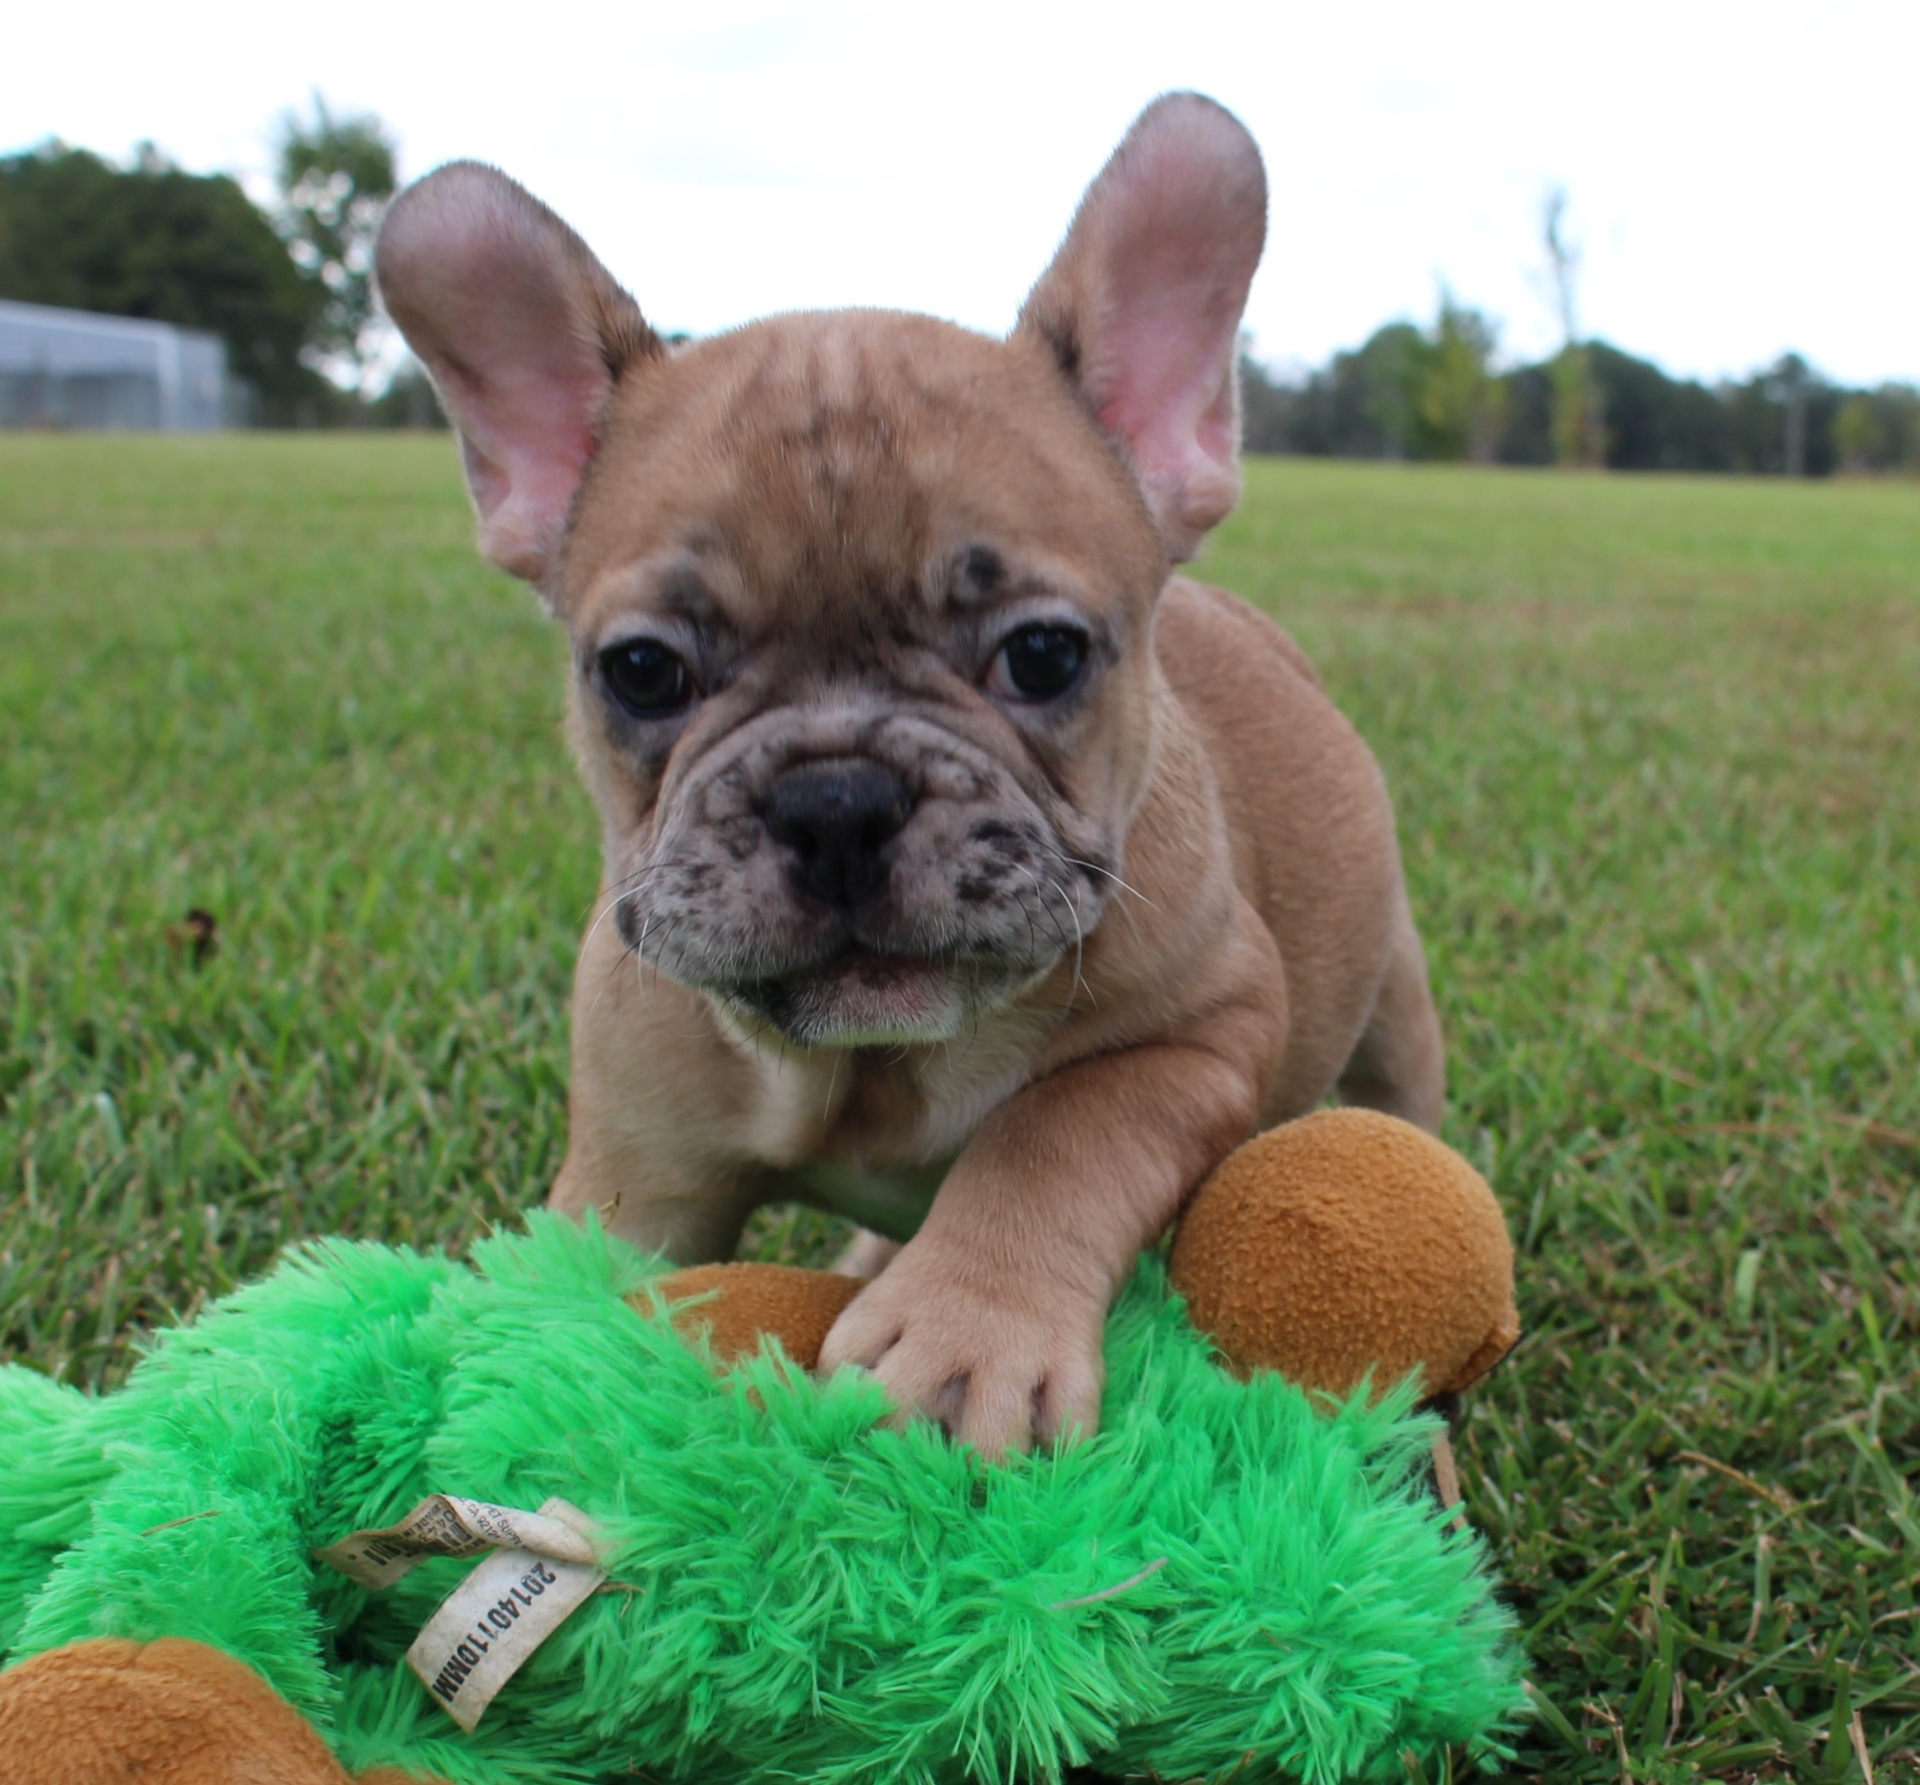 #FrenchBulldogPuppies #MerleFrenchBulldogPuppies #Frenchies